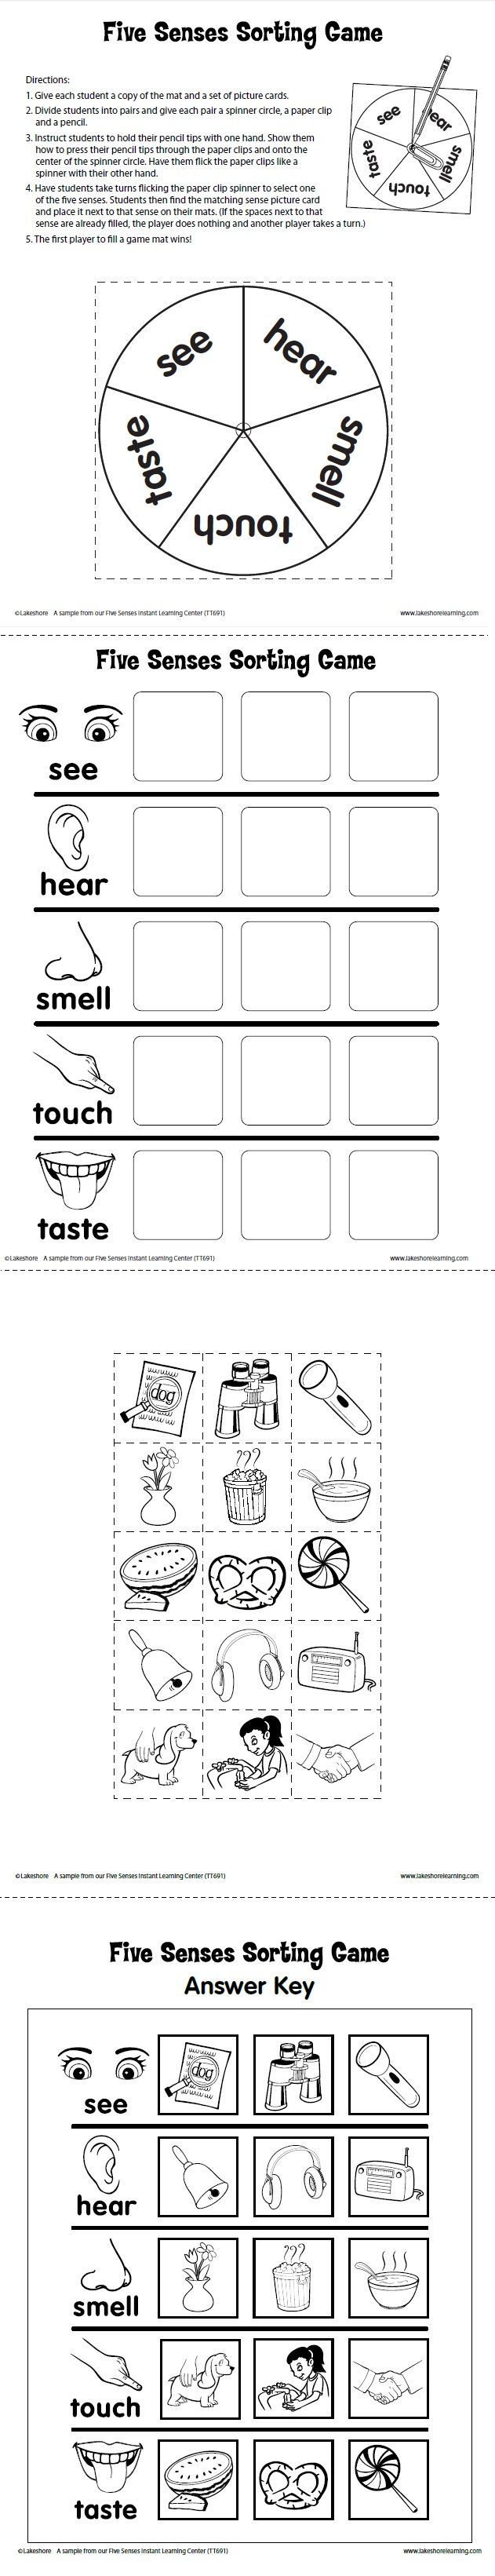 Five Senses Sorting Game Printable from Lakeshore Learning: